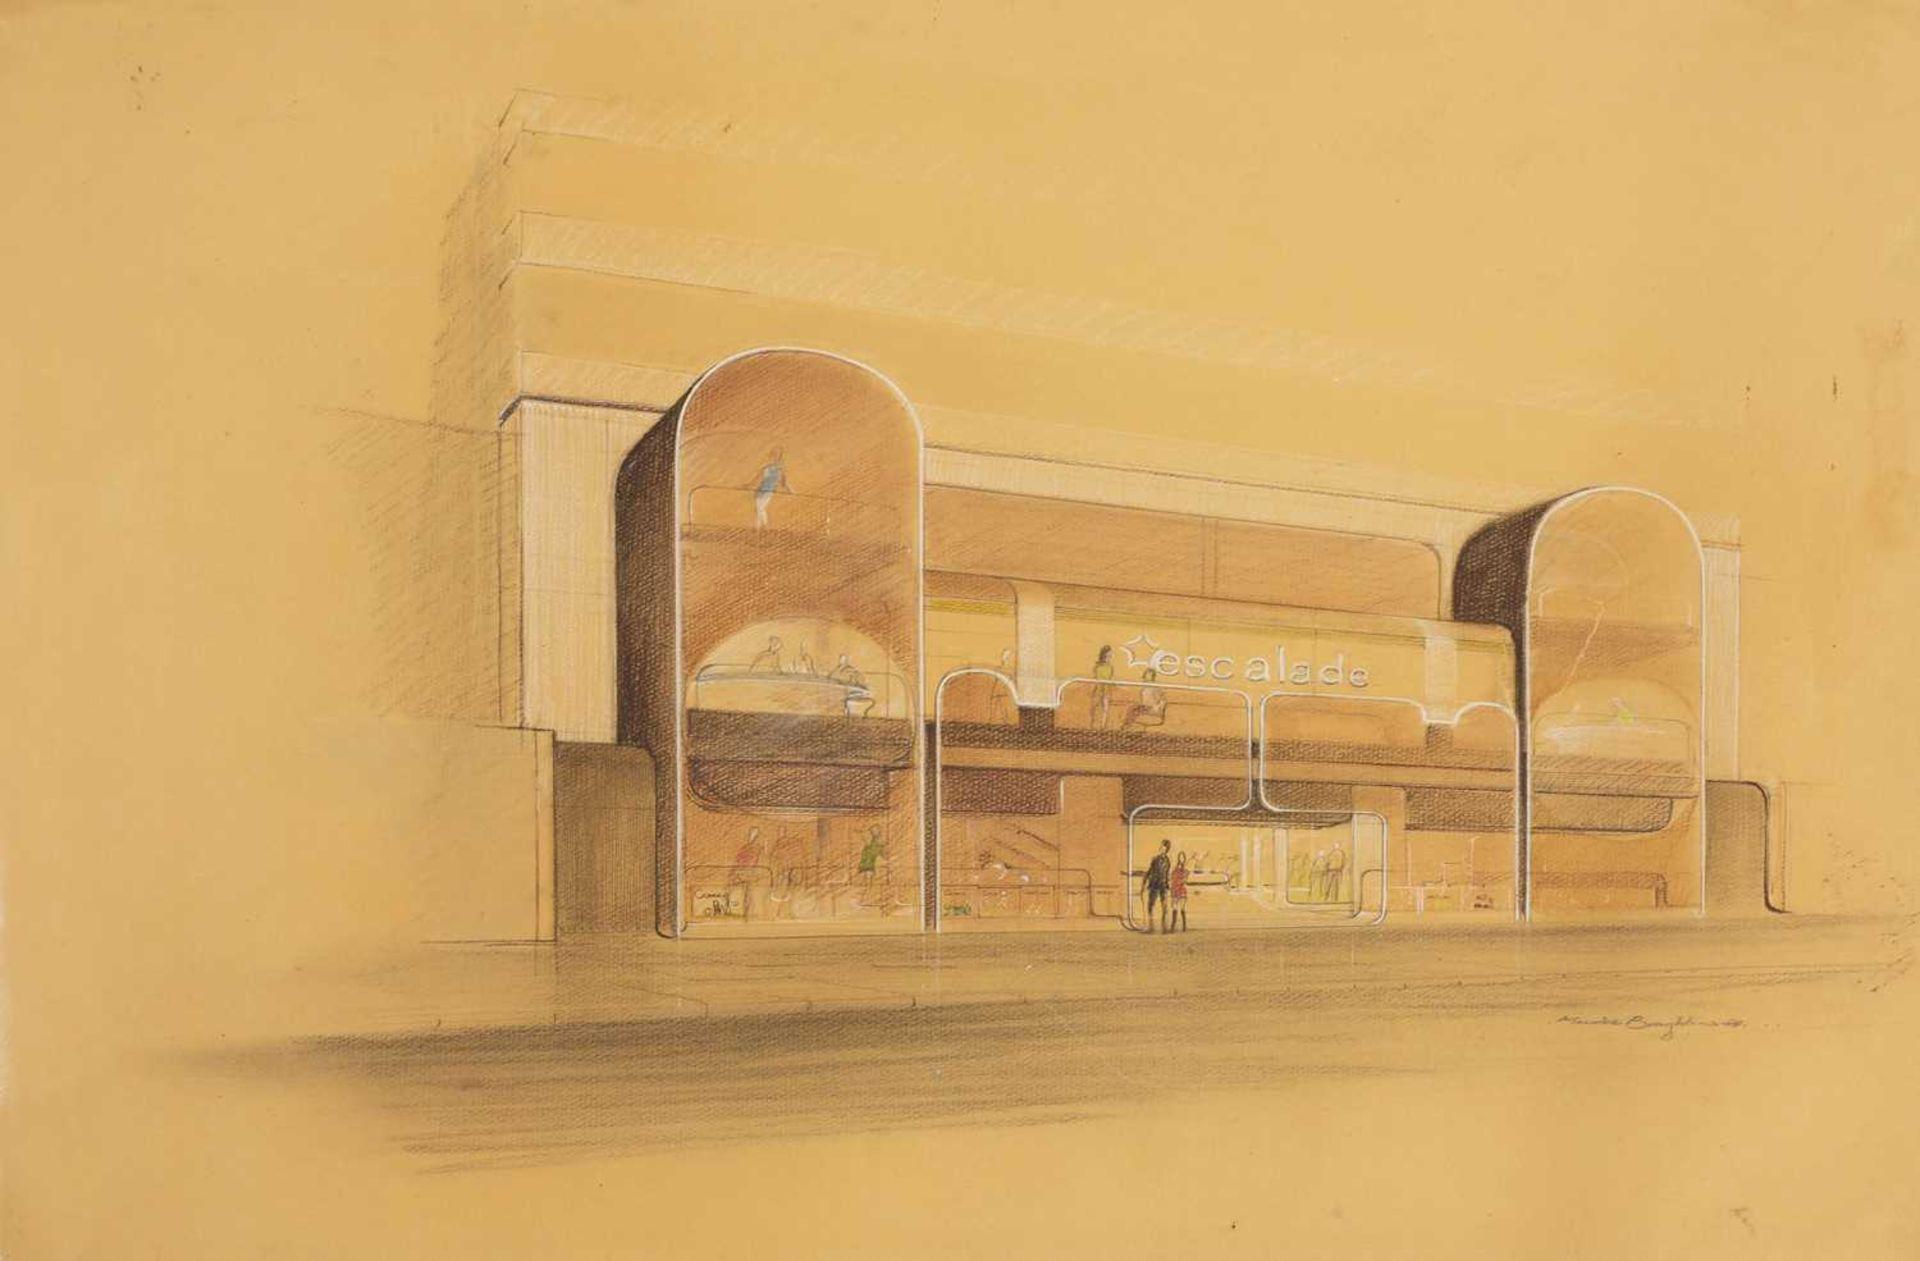 Maurice Broughton Associates, - Image 7 of 7